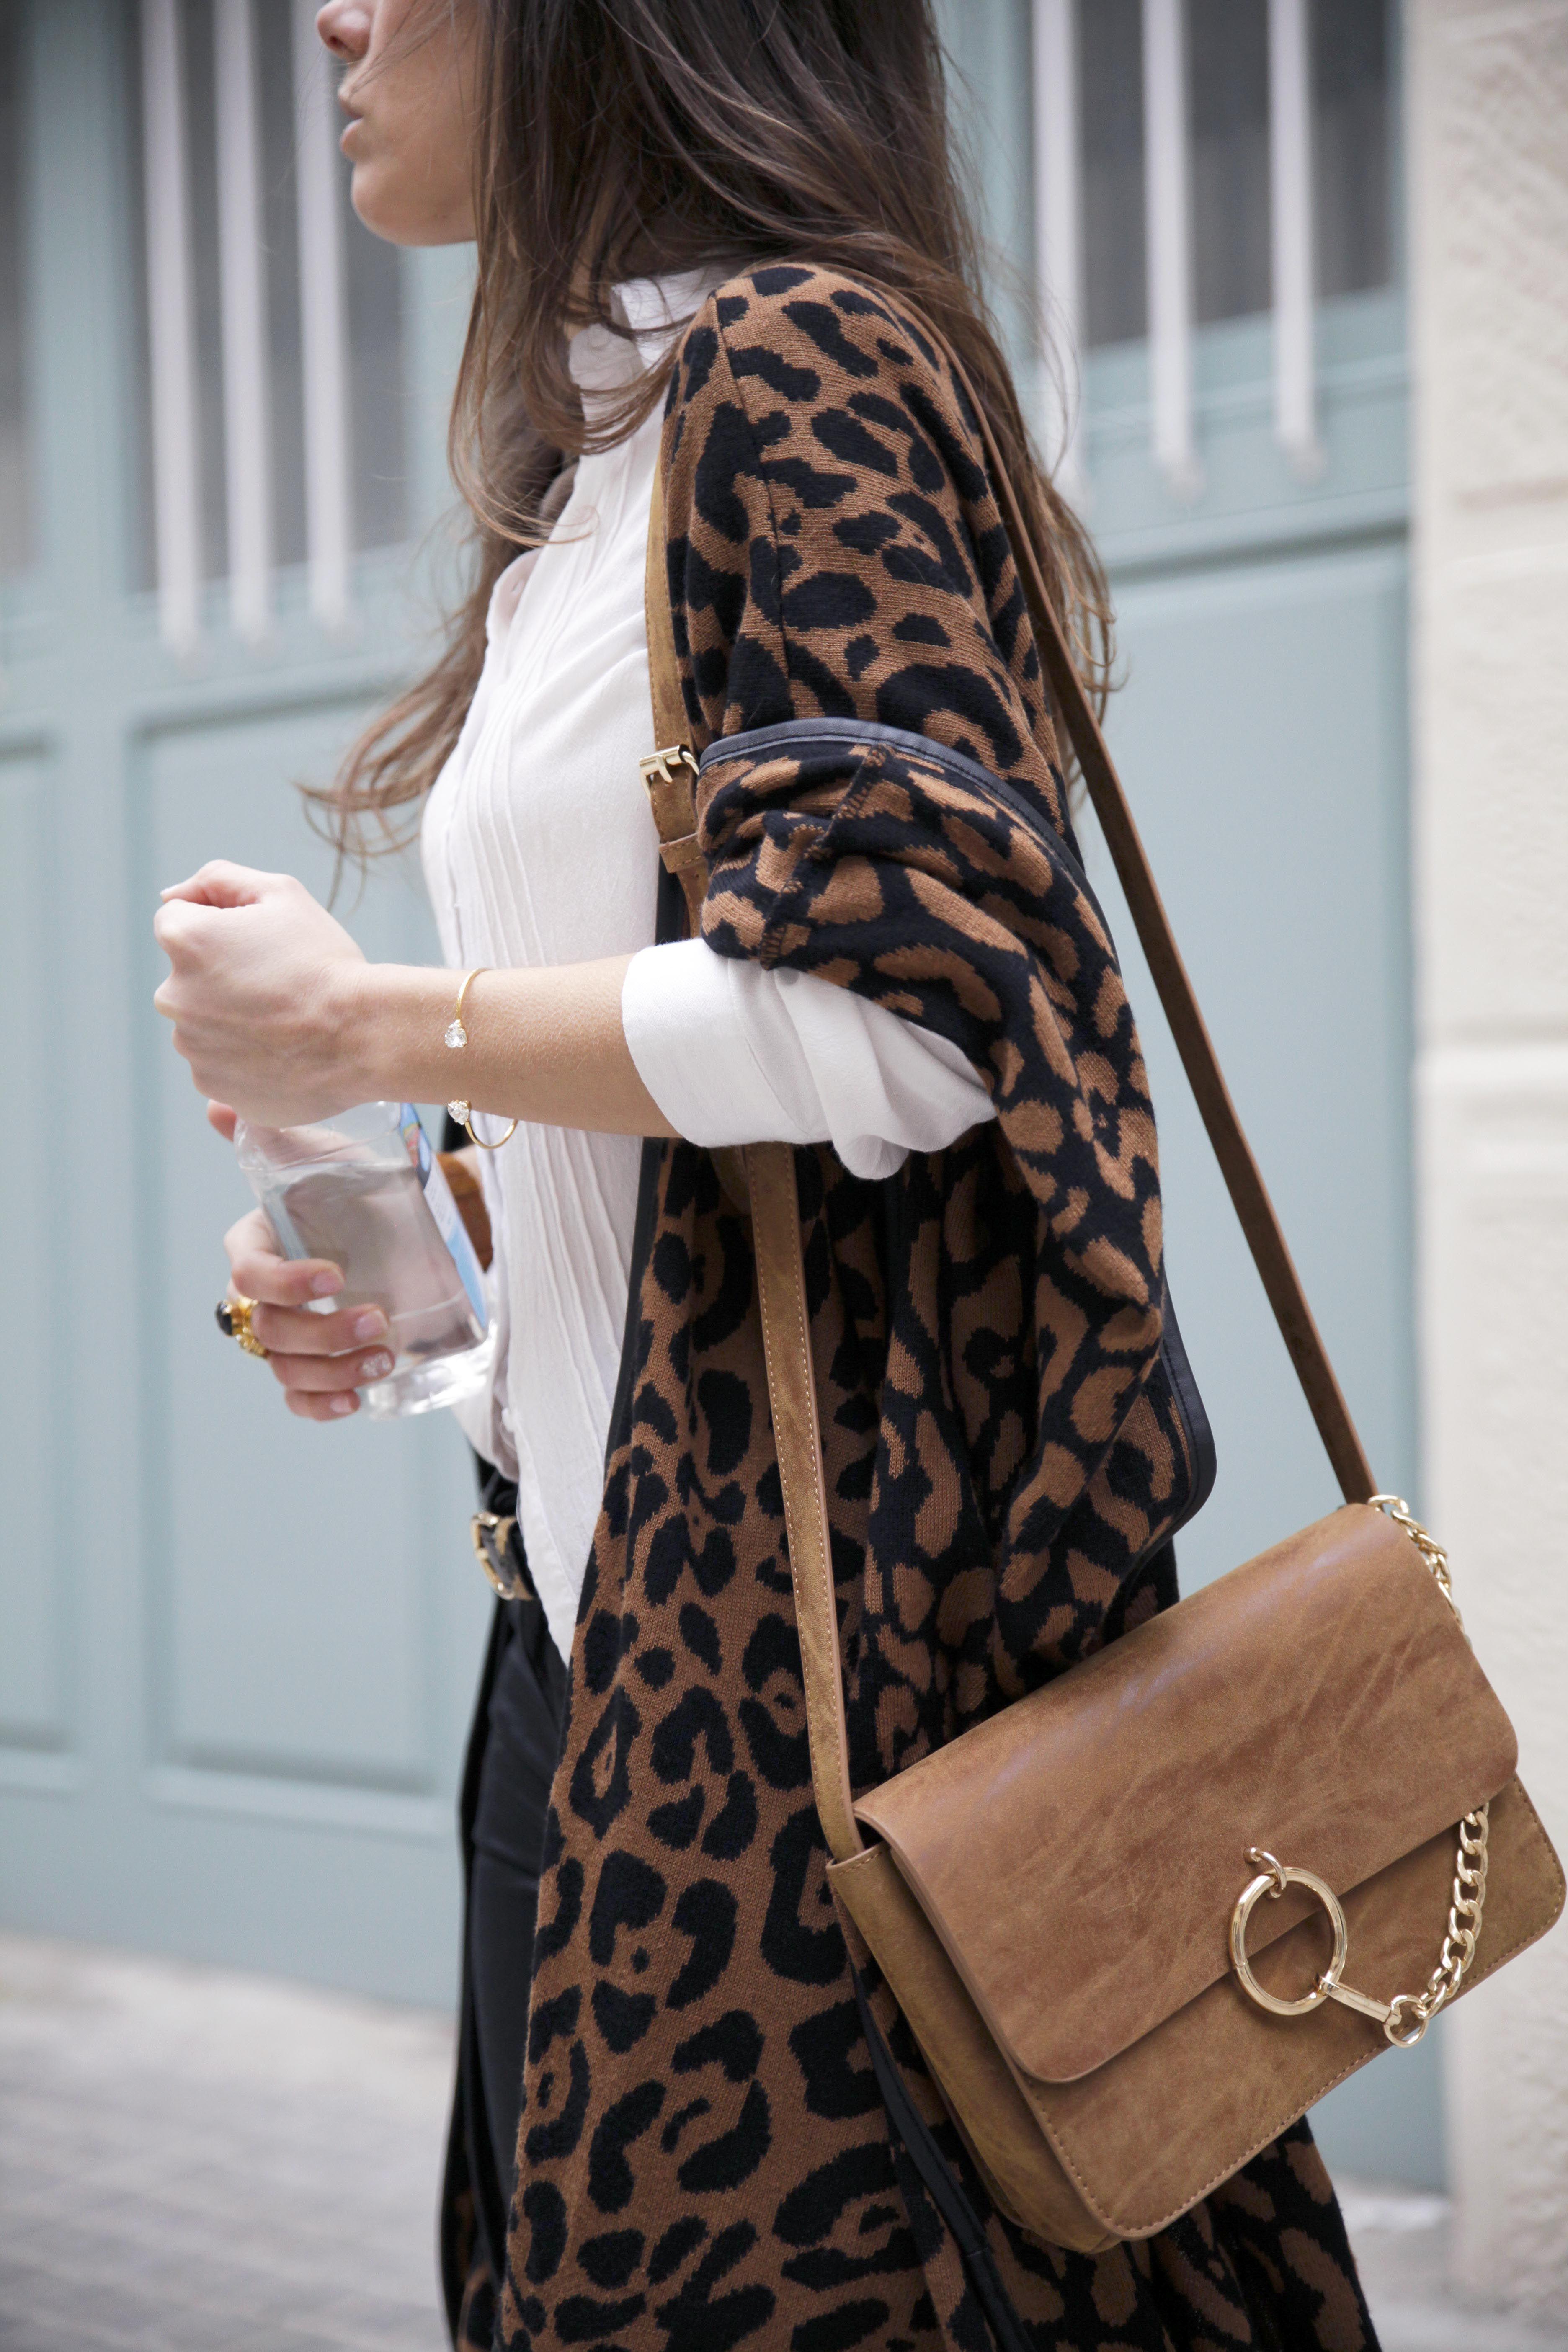 https://www.instagram.com/theguestgirl/  #theguestgirl #fashion #fashionblogger #blogger #barcelona #influencer #streetstyle